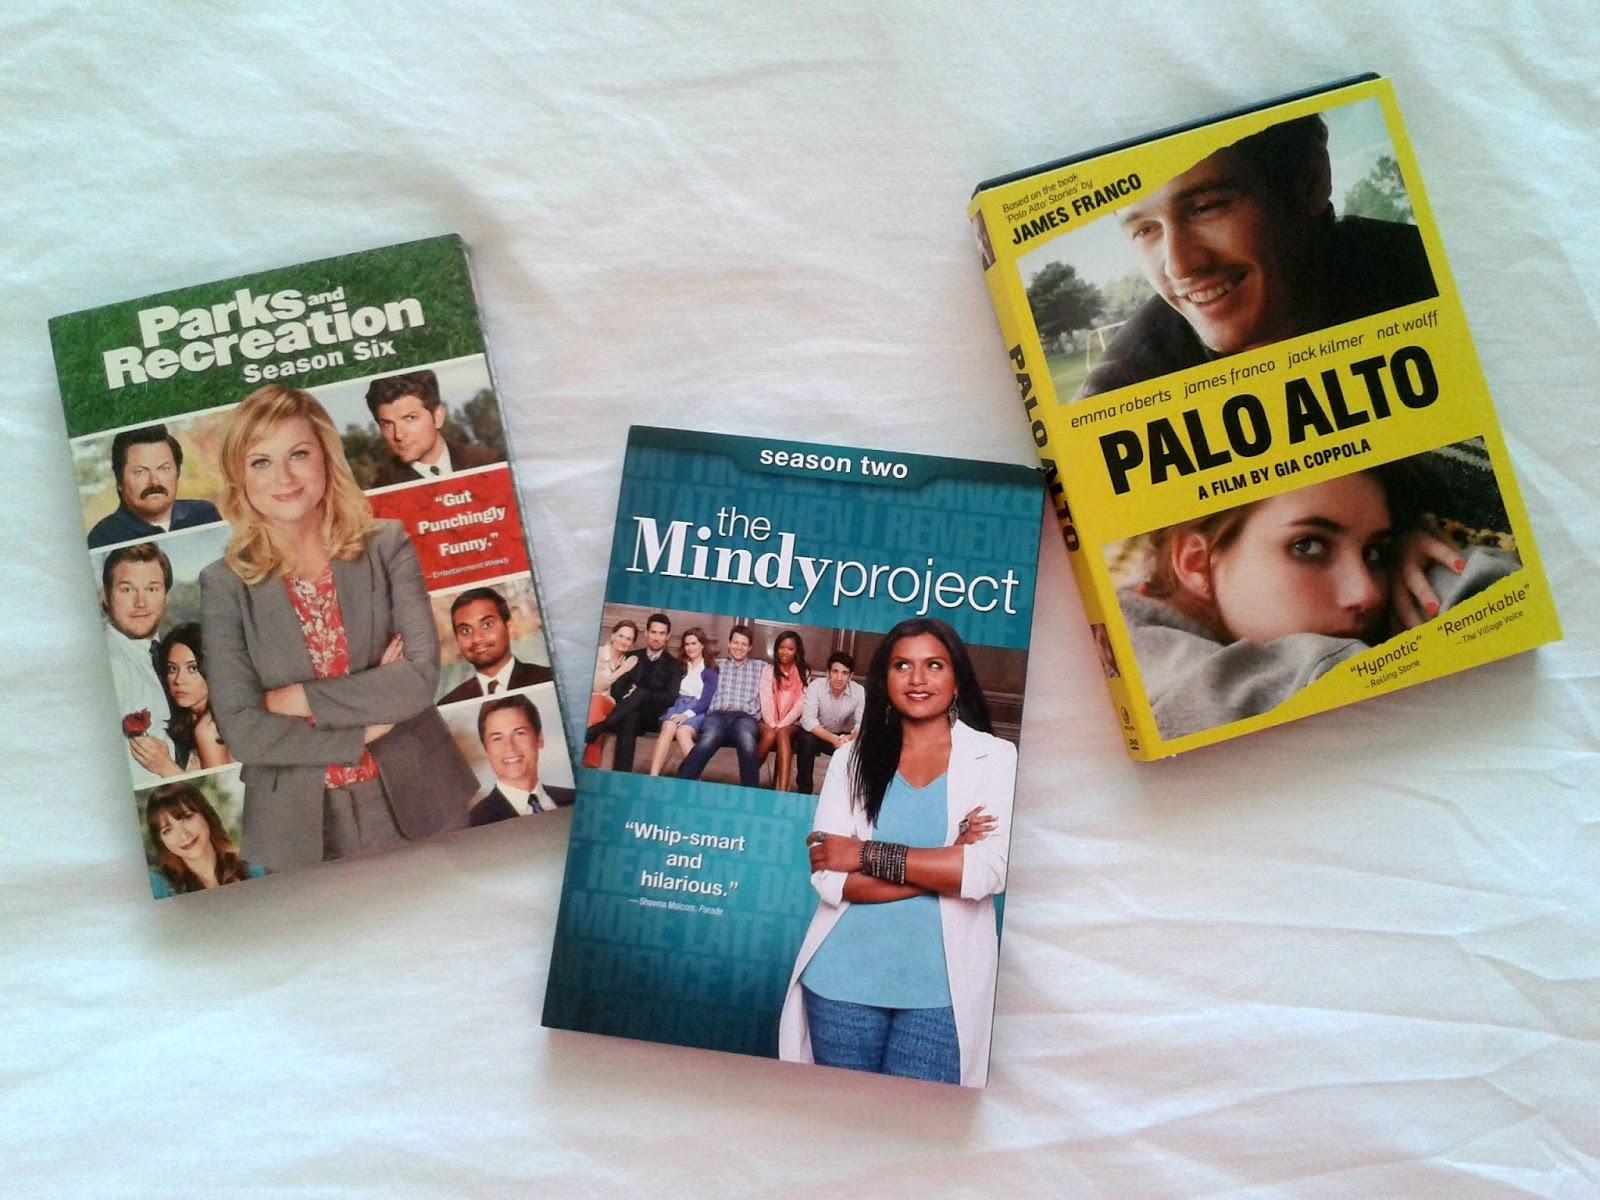 Parks & Recreation Season 6 The Mindy Project Season 2 Palo Alto DVDs Haul